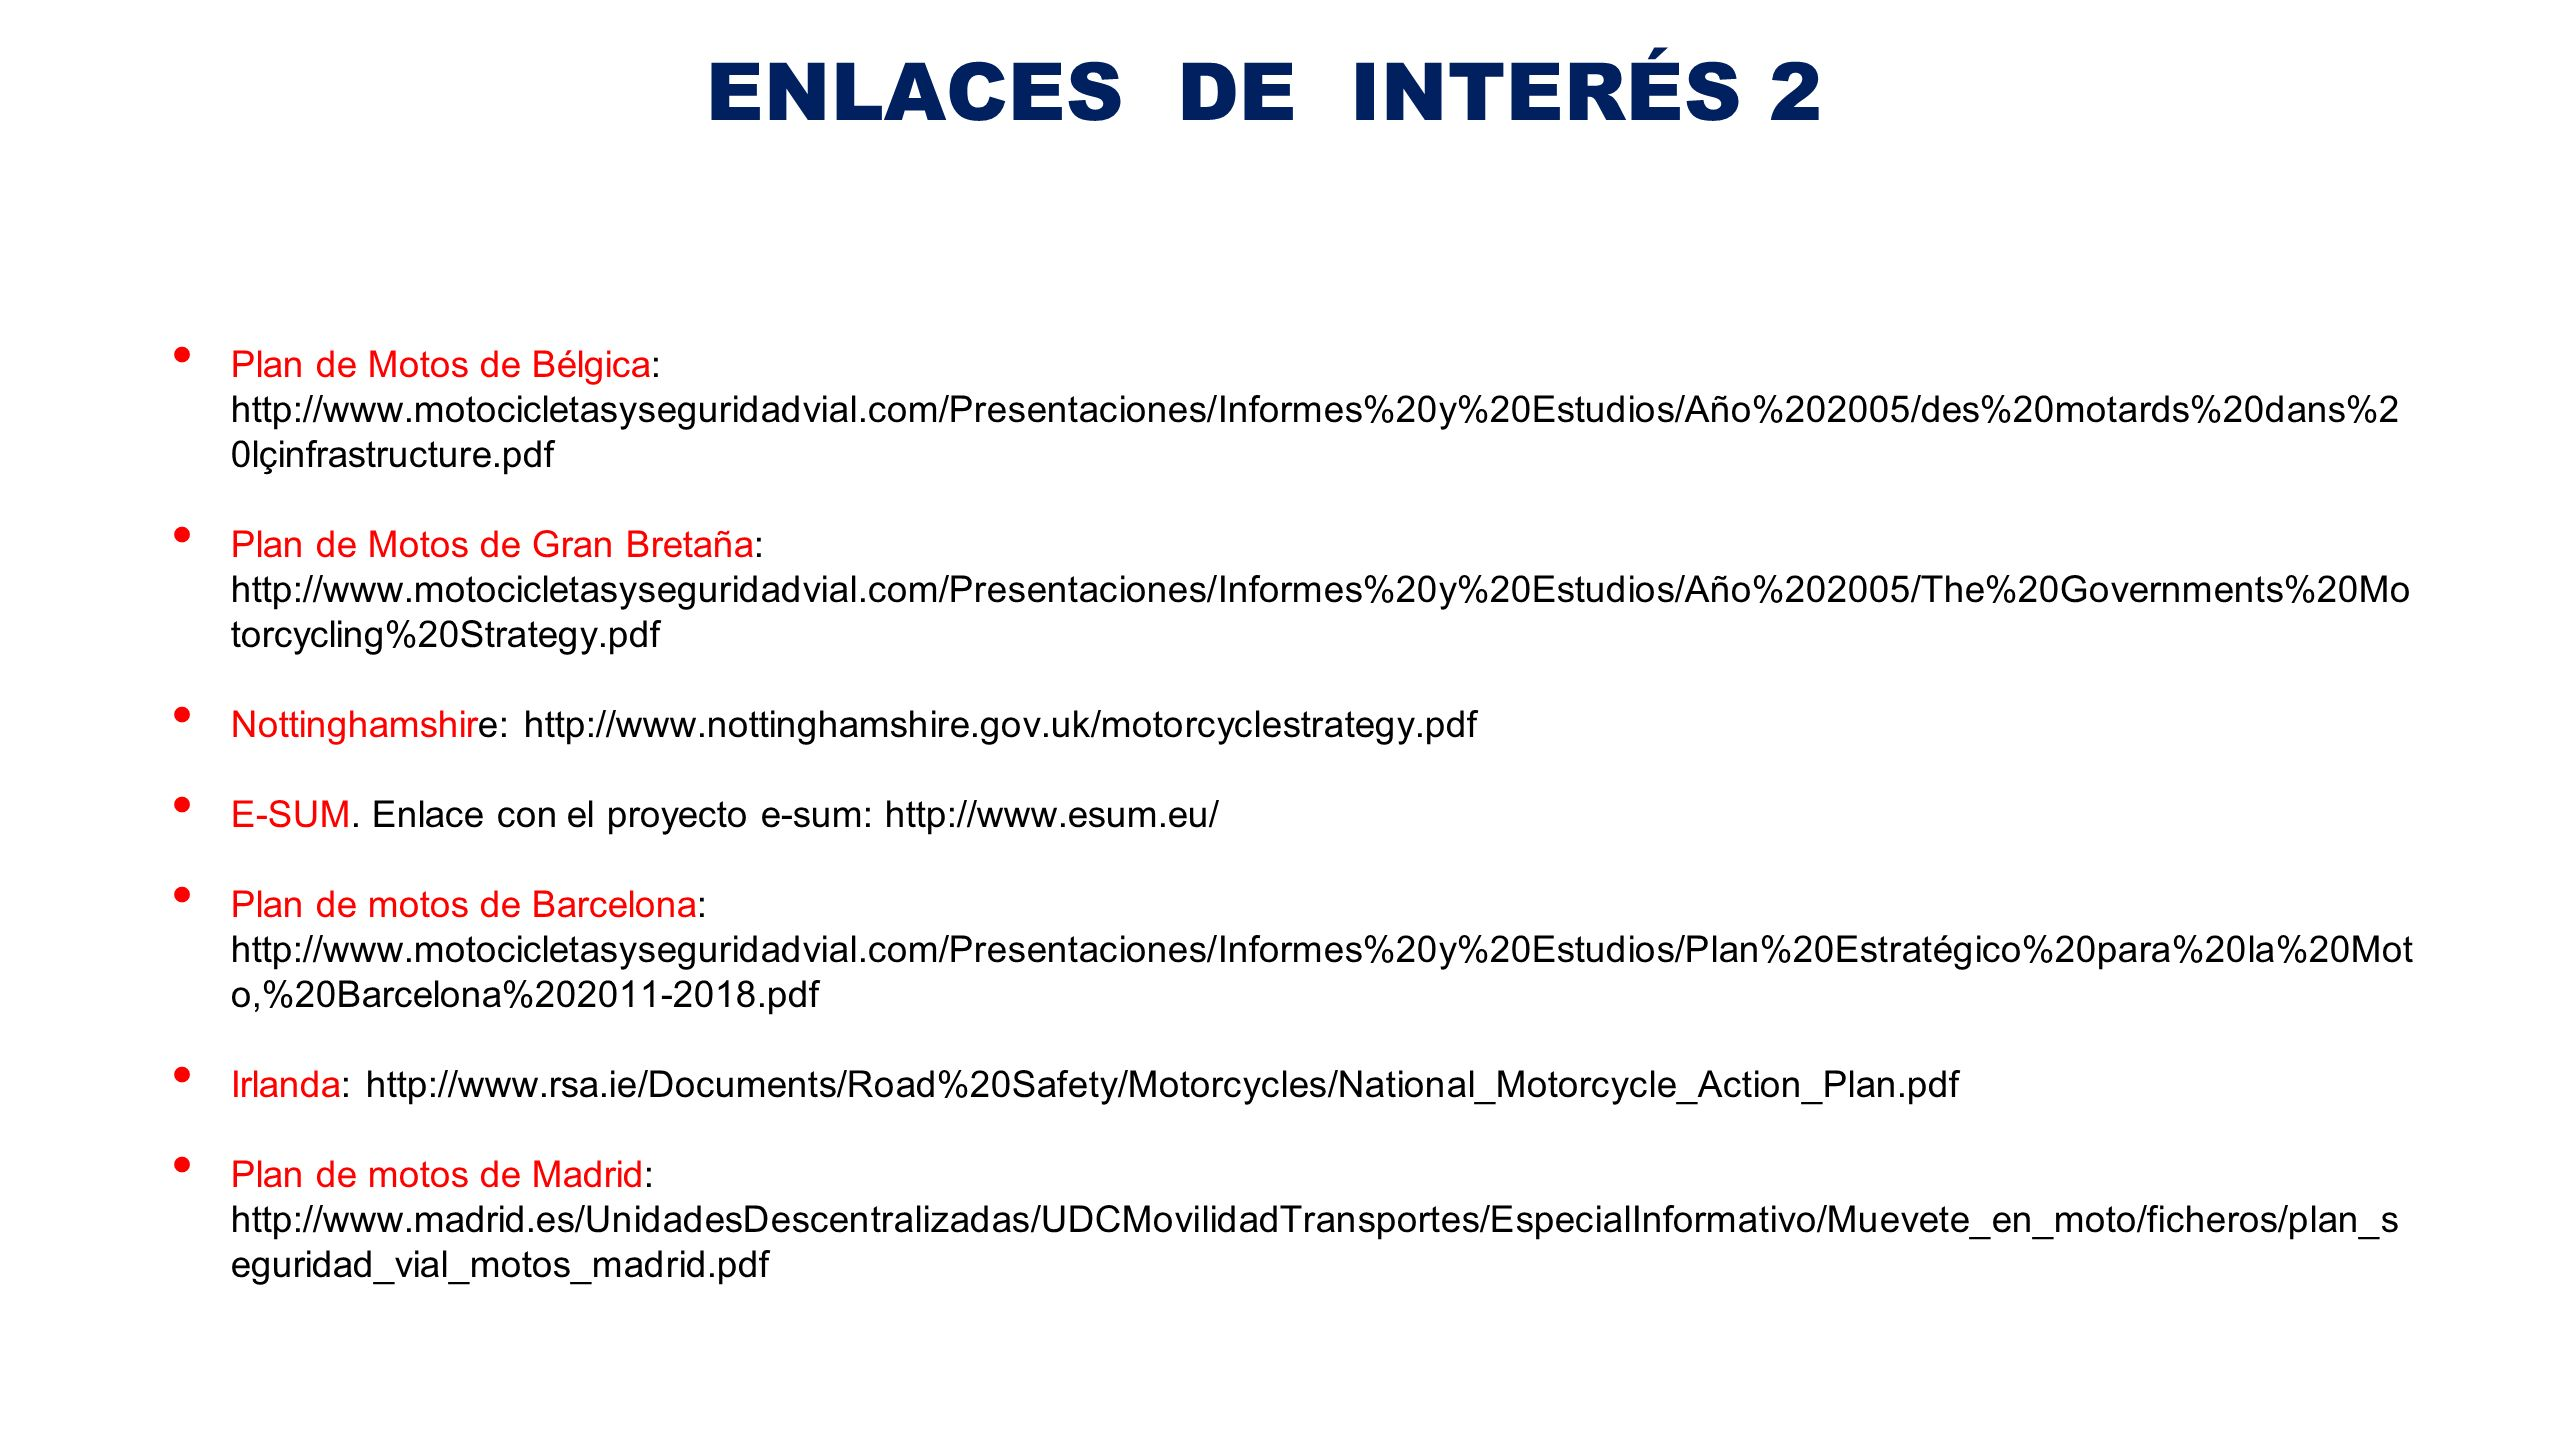 ENLACES DE INTERÉS 2